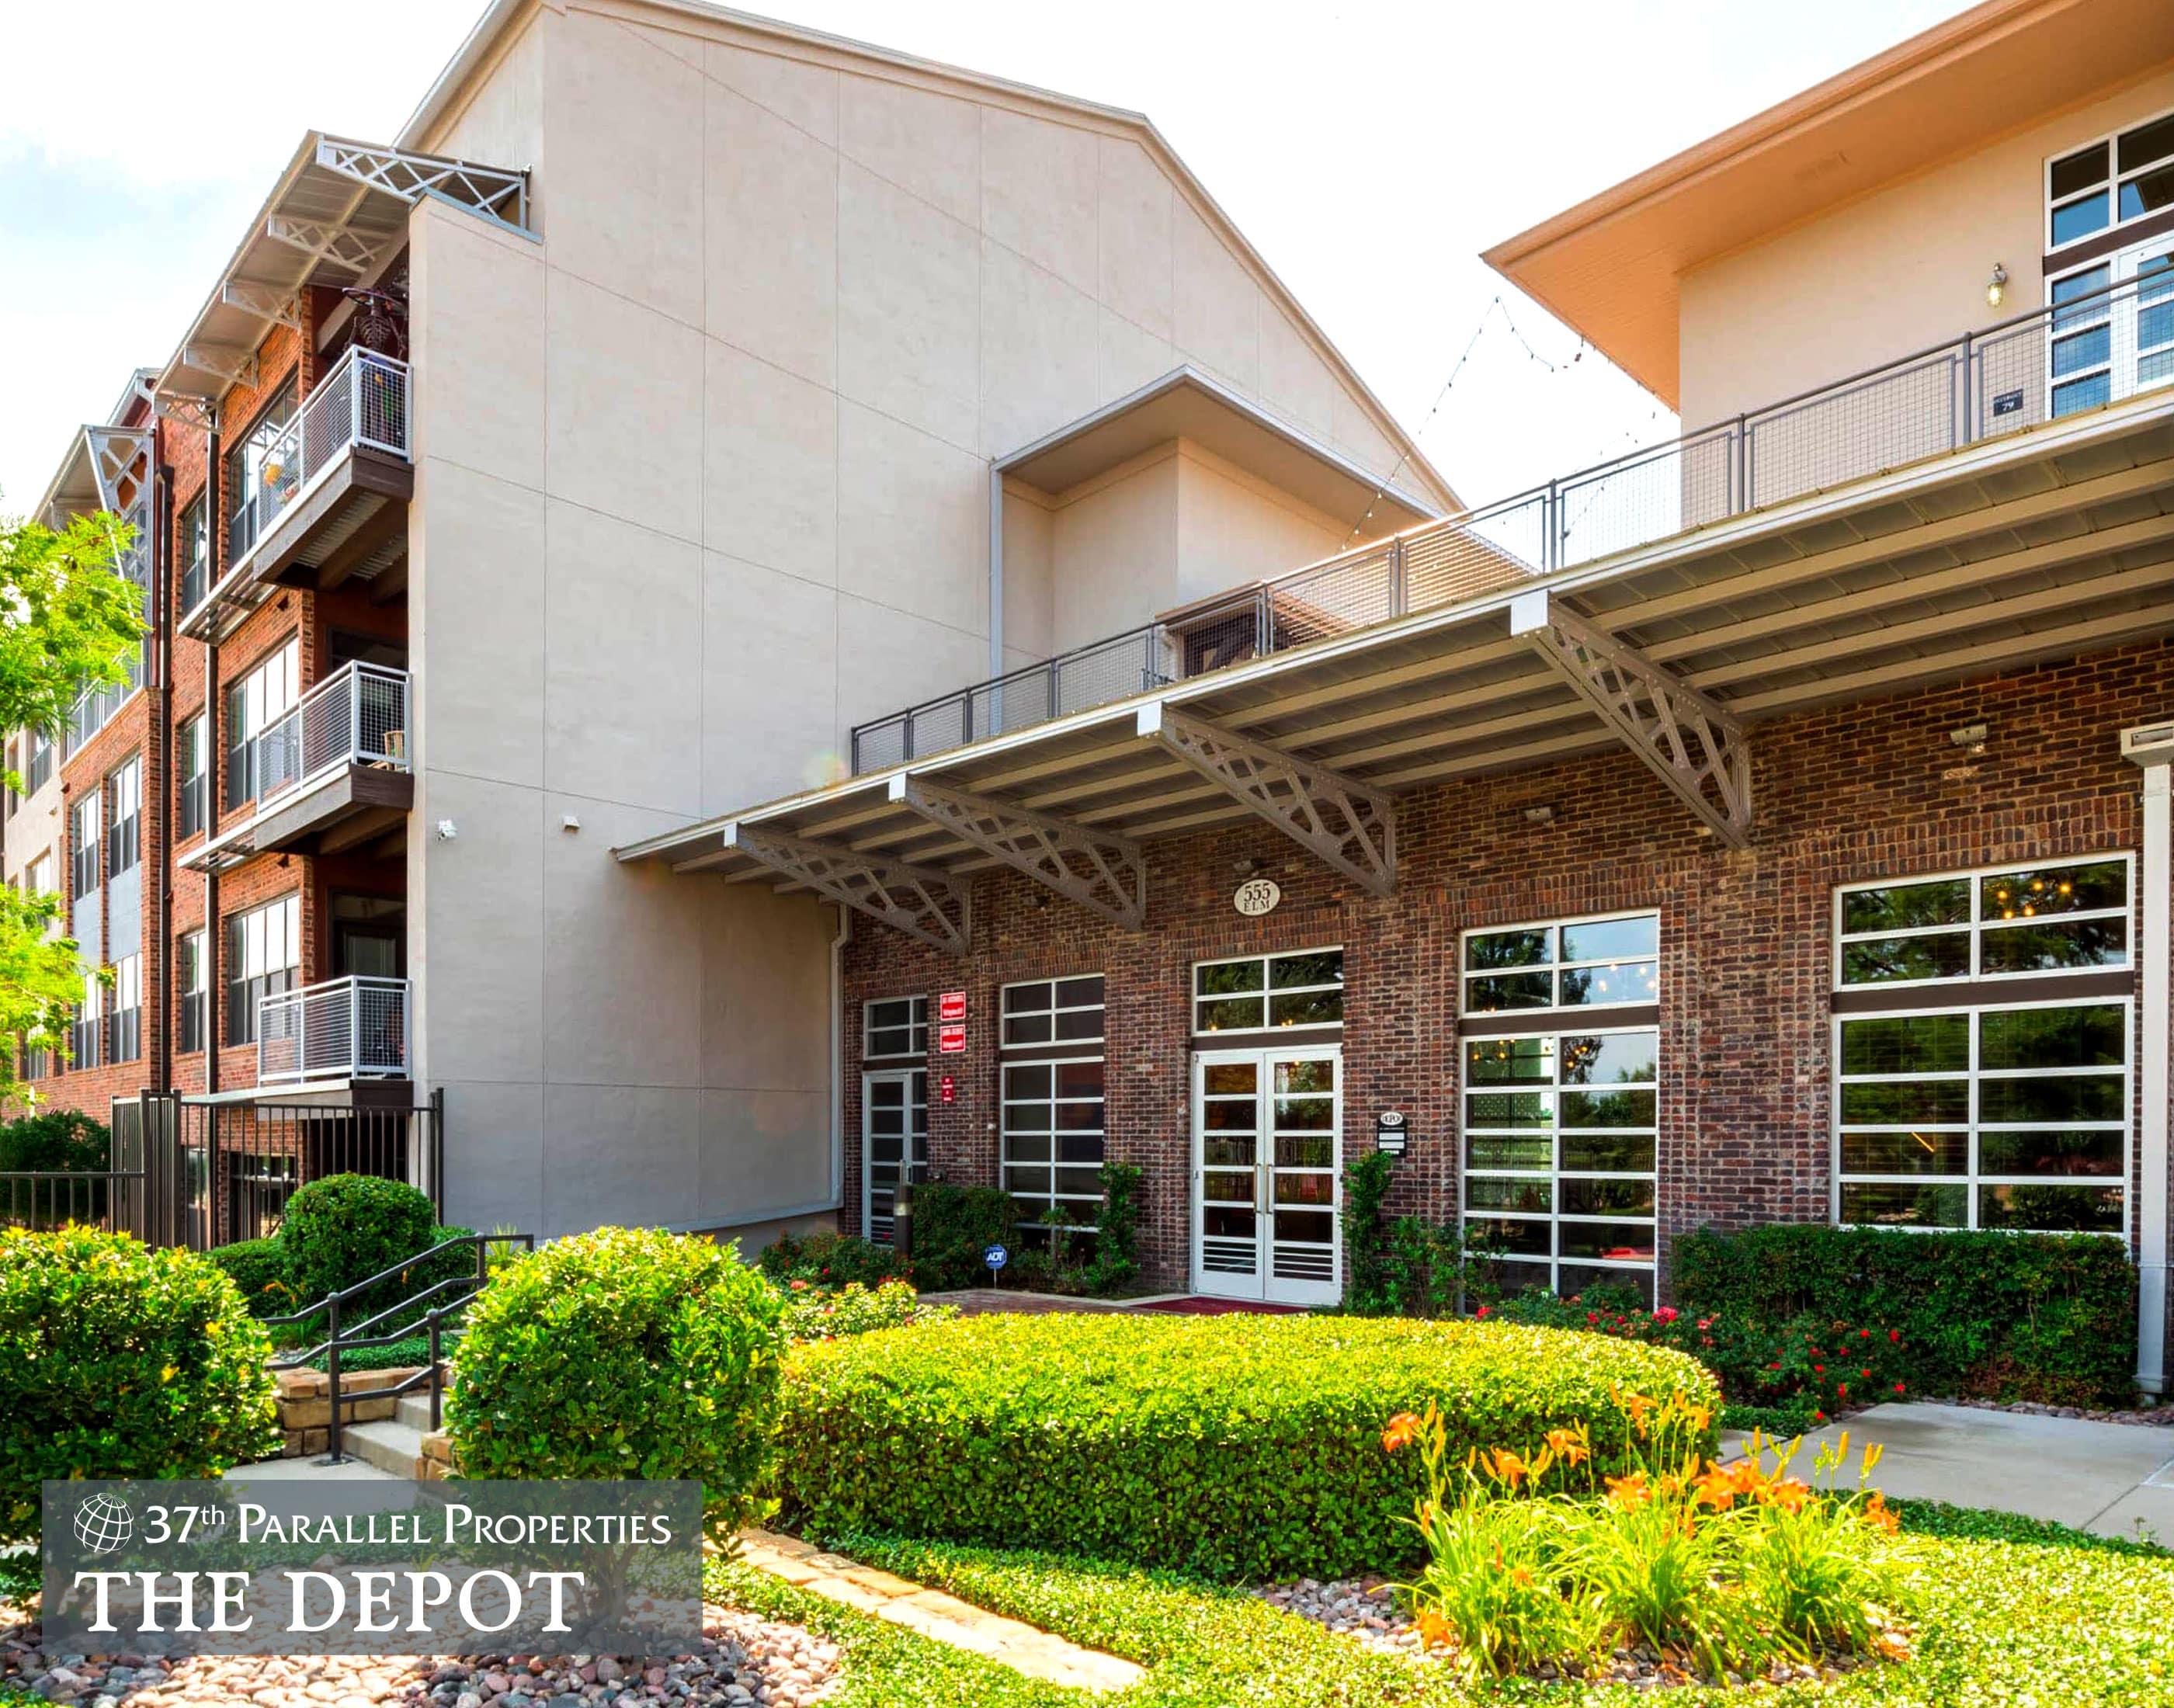 multifamily real estate portfolio, Multifamily Real Estate Portfolio